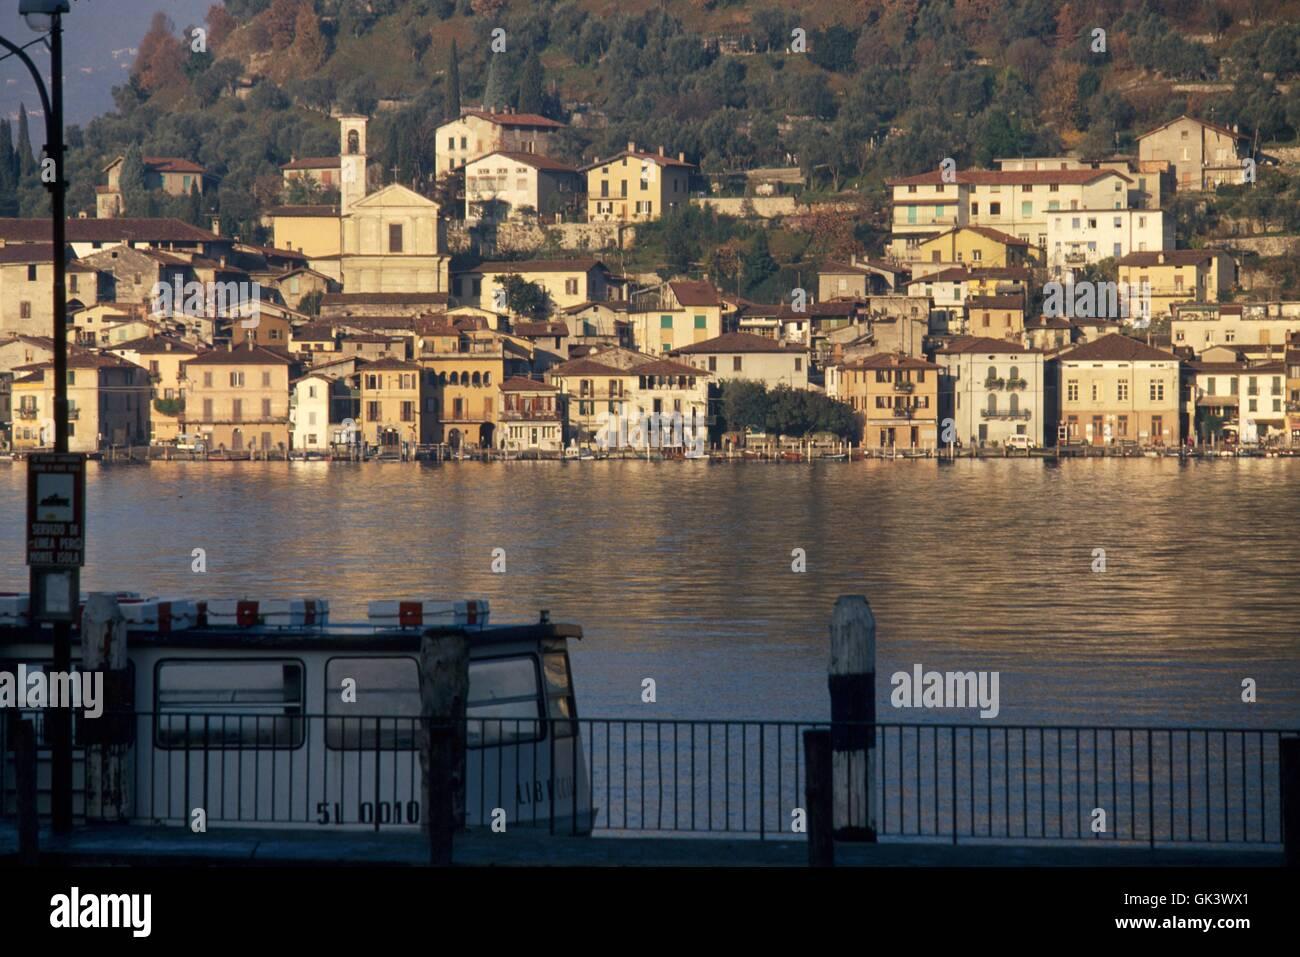 Italy, Lombardy region, Iseo lake, the Peschiera Maraglio village on Montisola island - Stock Image